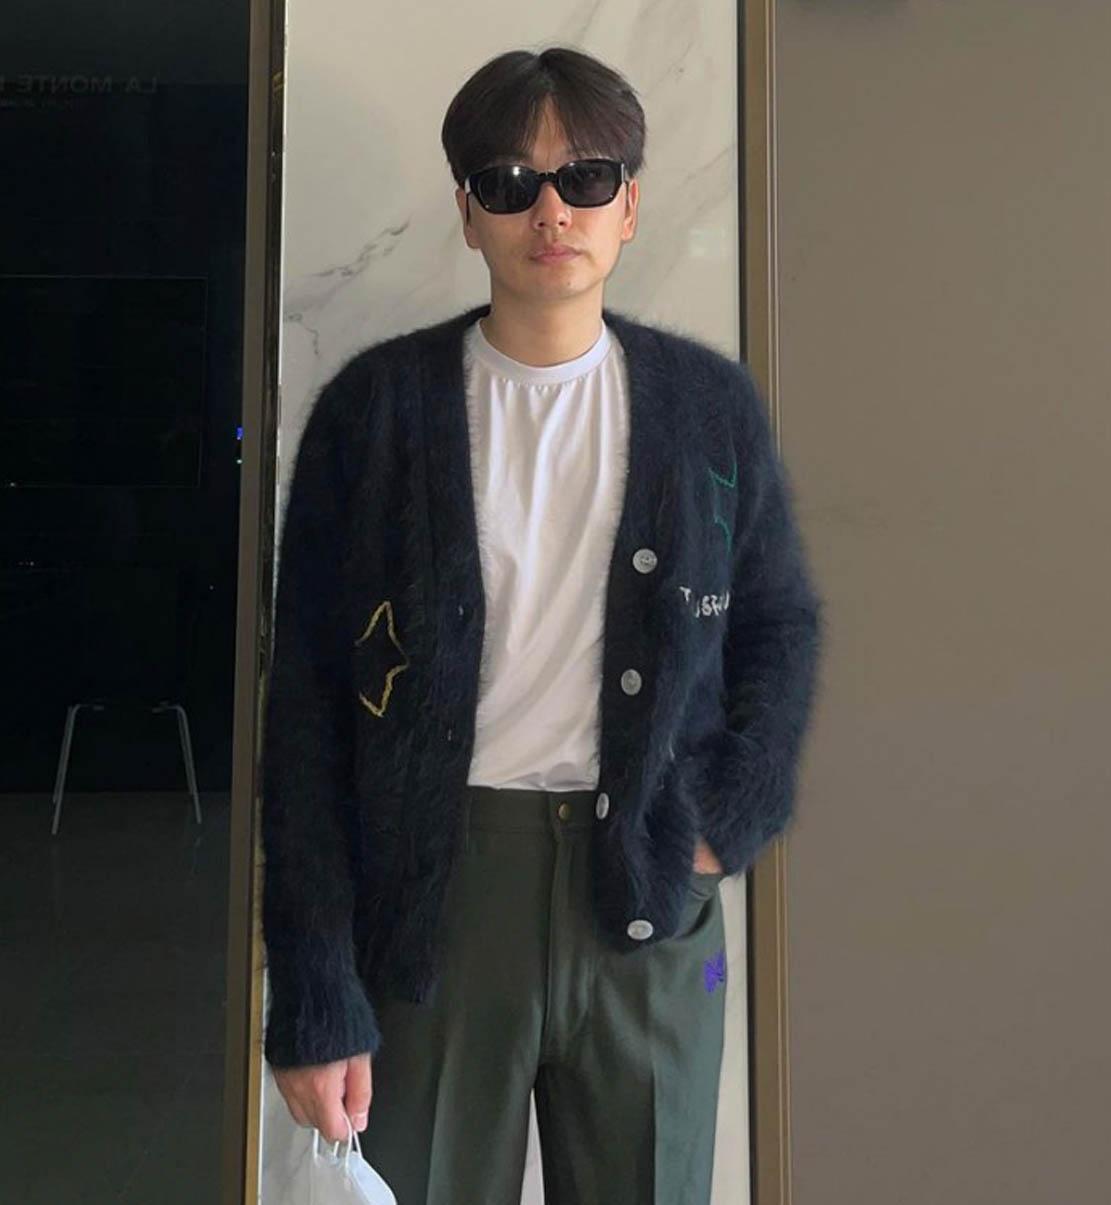 Lee Dong-hwi (Instagram/dlehdgnl)